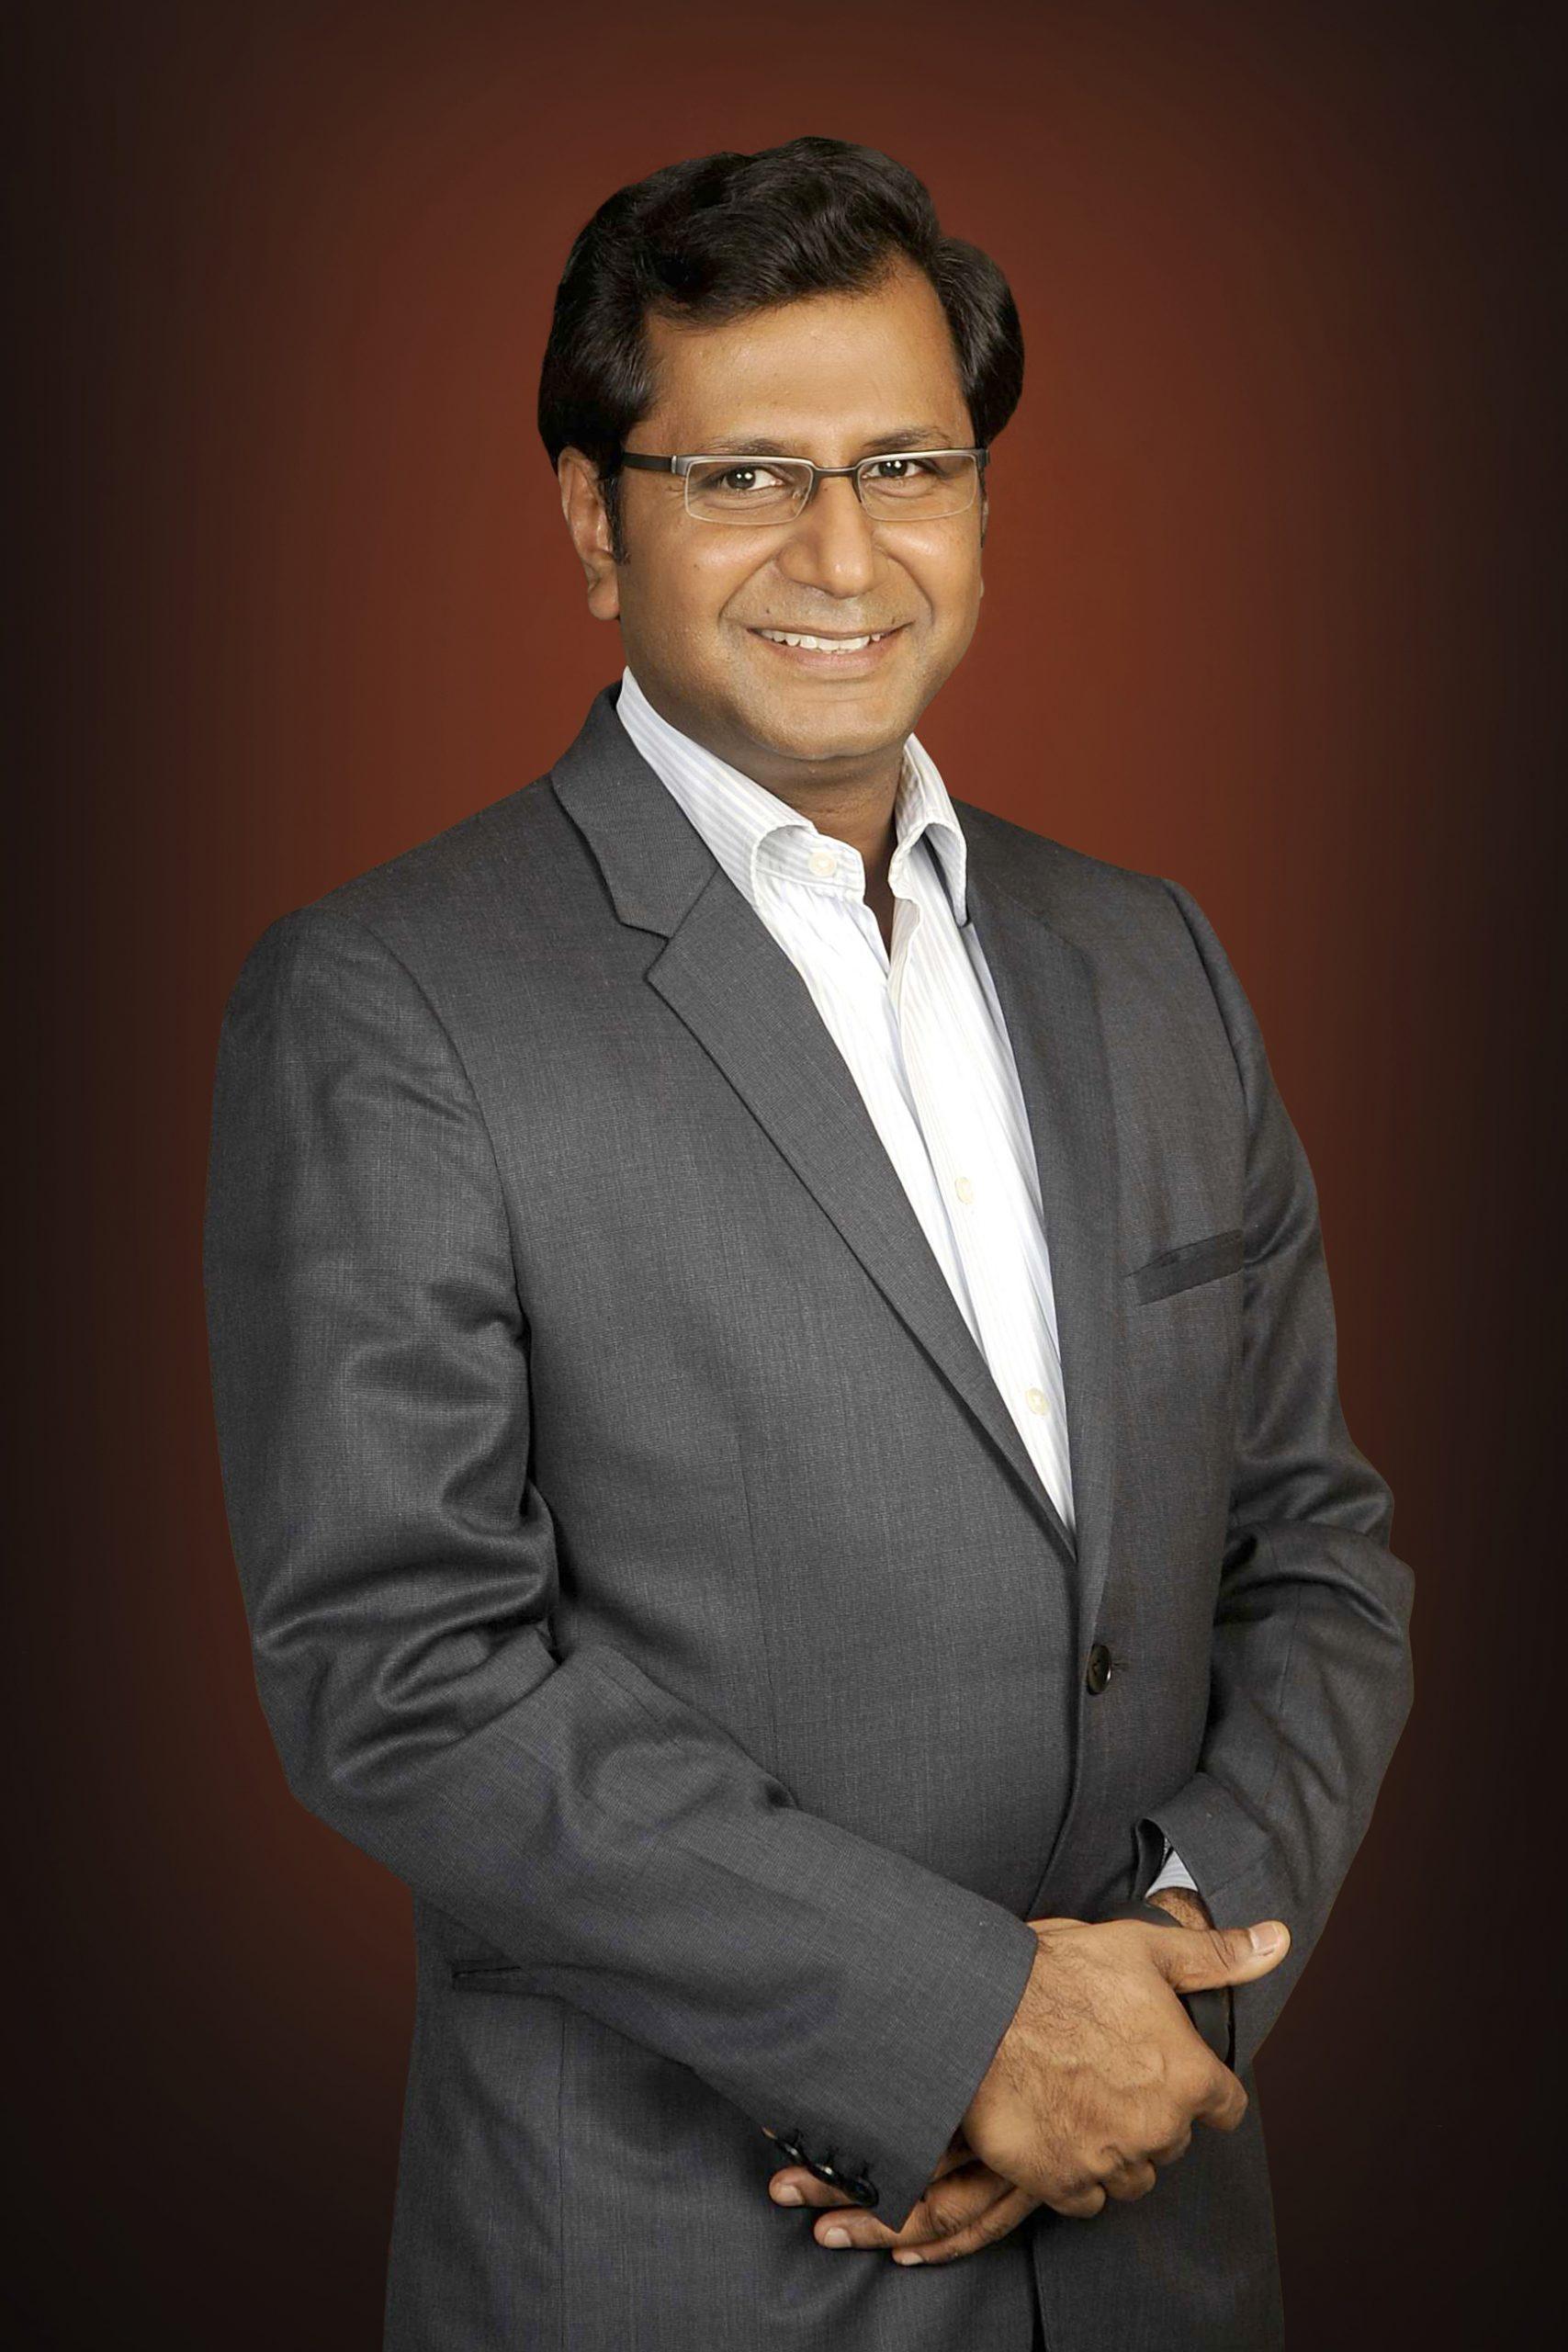 Amit Bansal, CEO & Founder of WizKlub